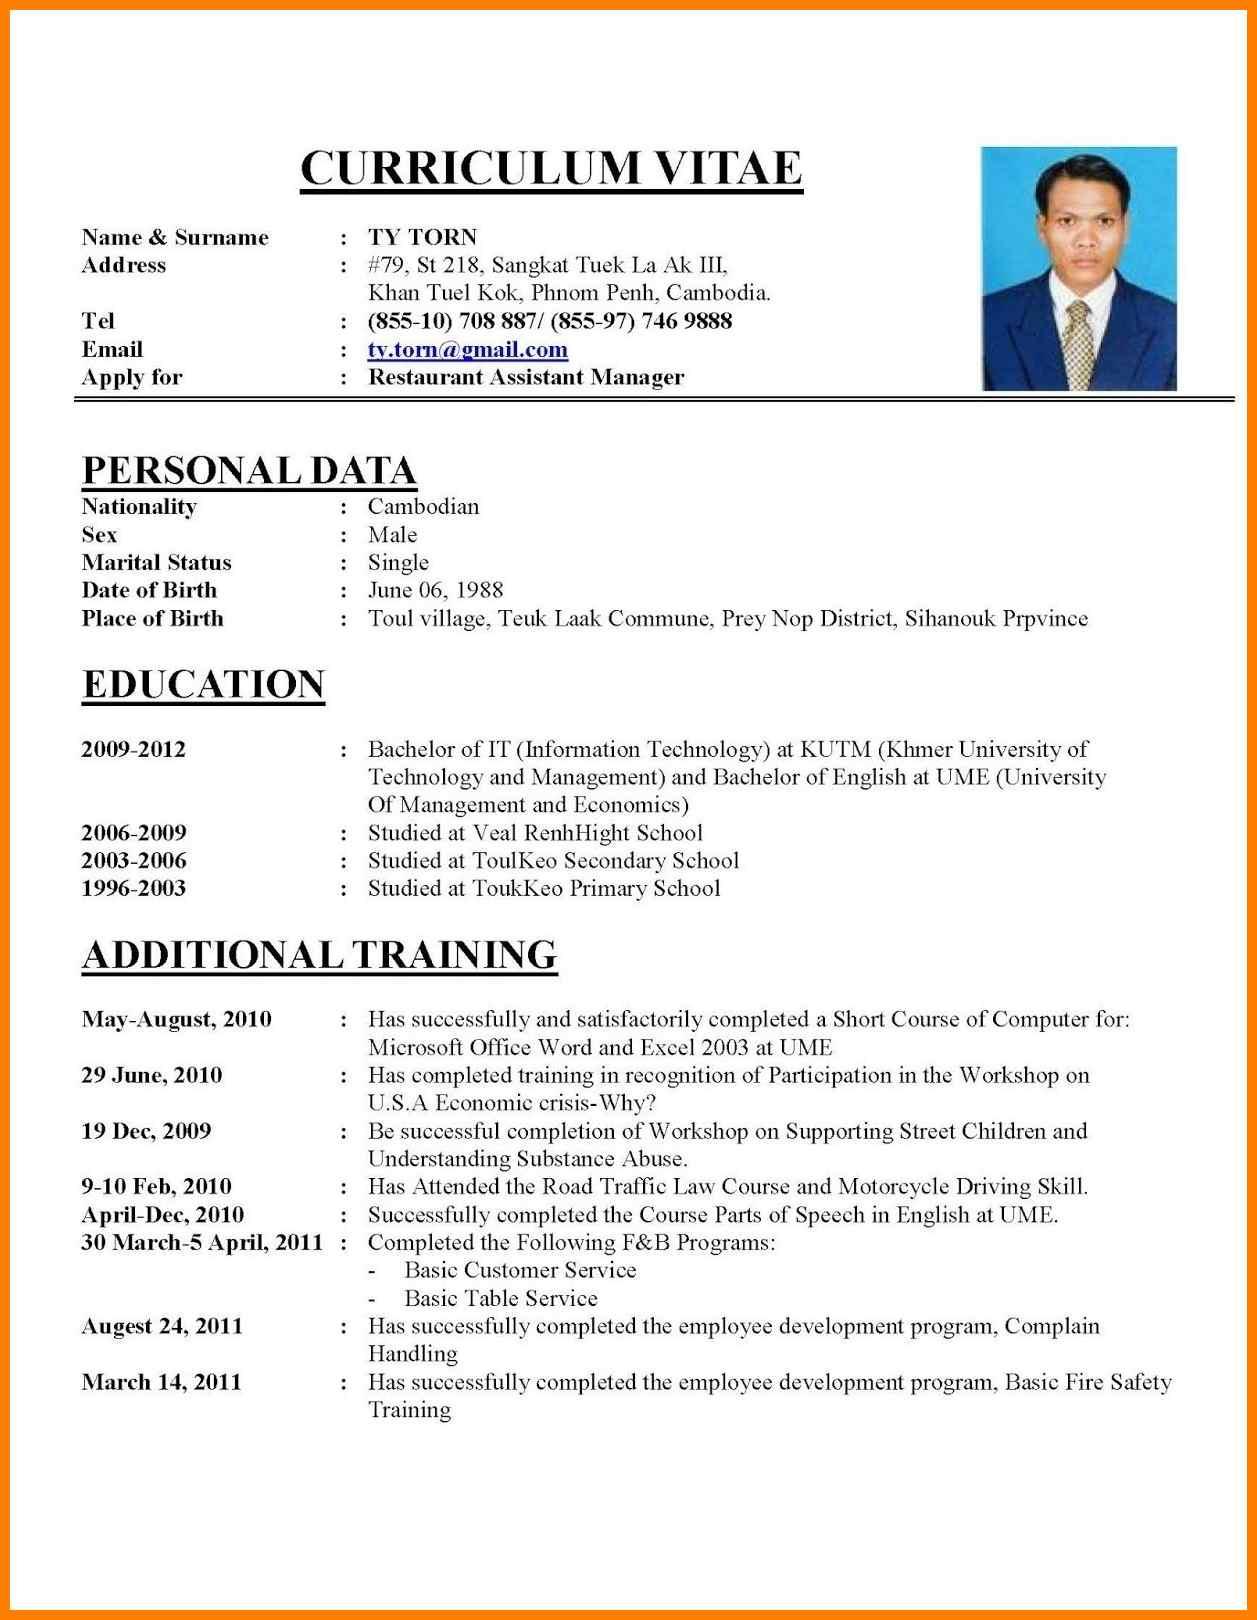 How To Write Resume How To Write A Cv Example How To Write Cv Resume Resume Cv Sample Cv Resume Sample Examples How To Write A Resume Example how to write resume|wikiresume.com